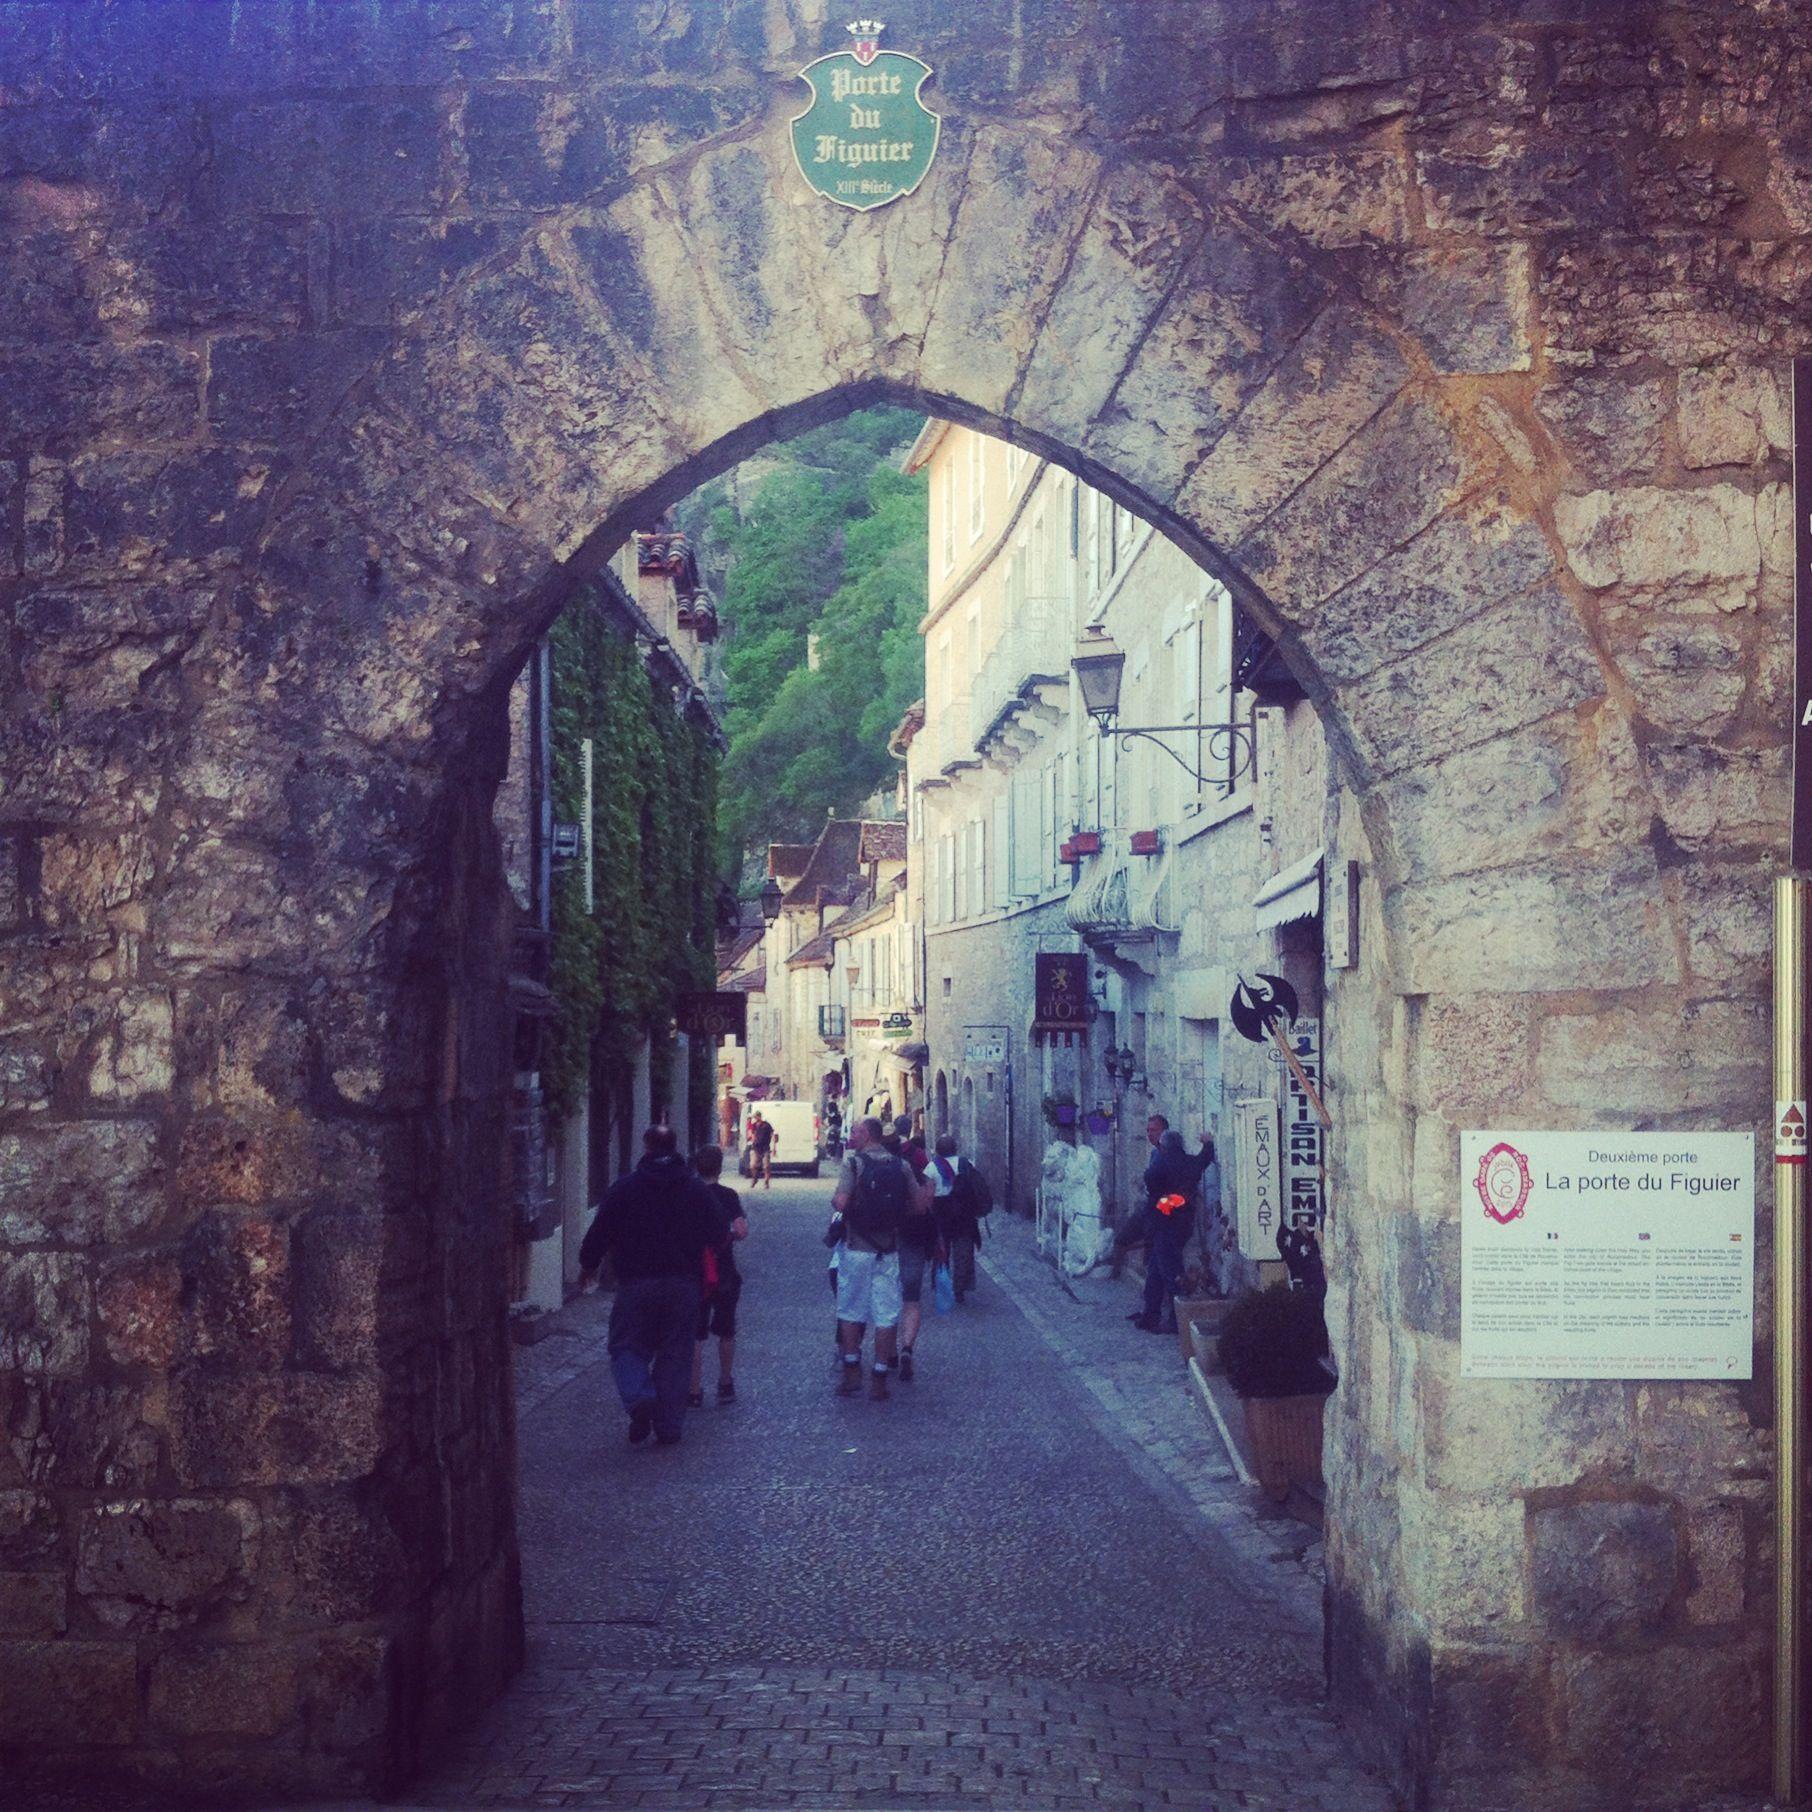 Entrance to Rocamadour